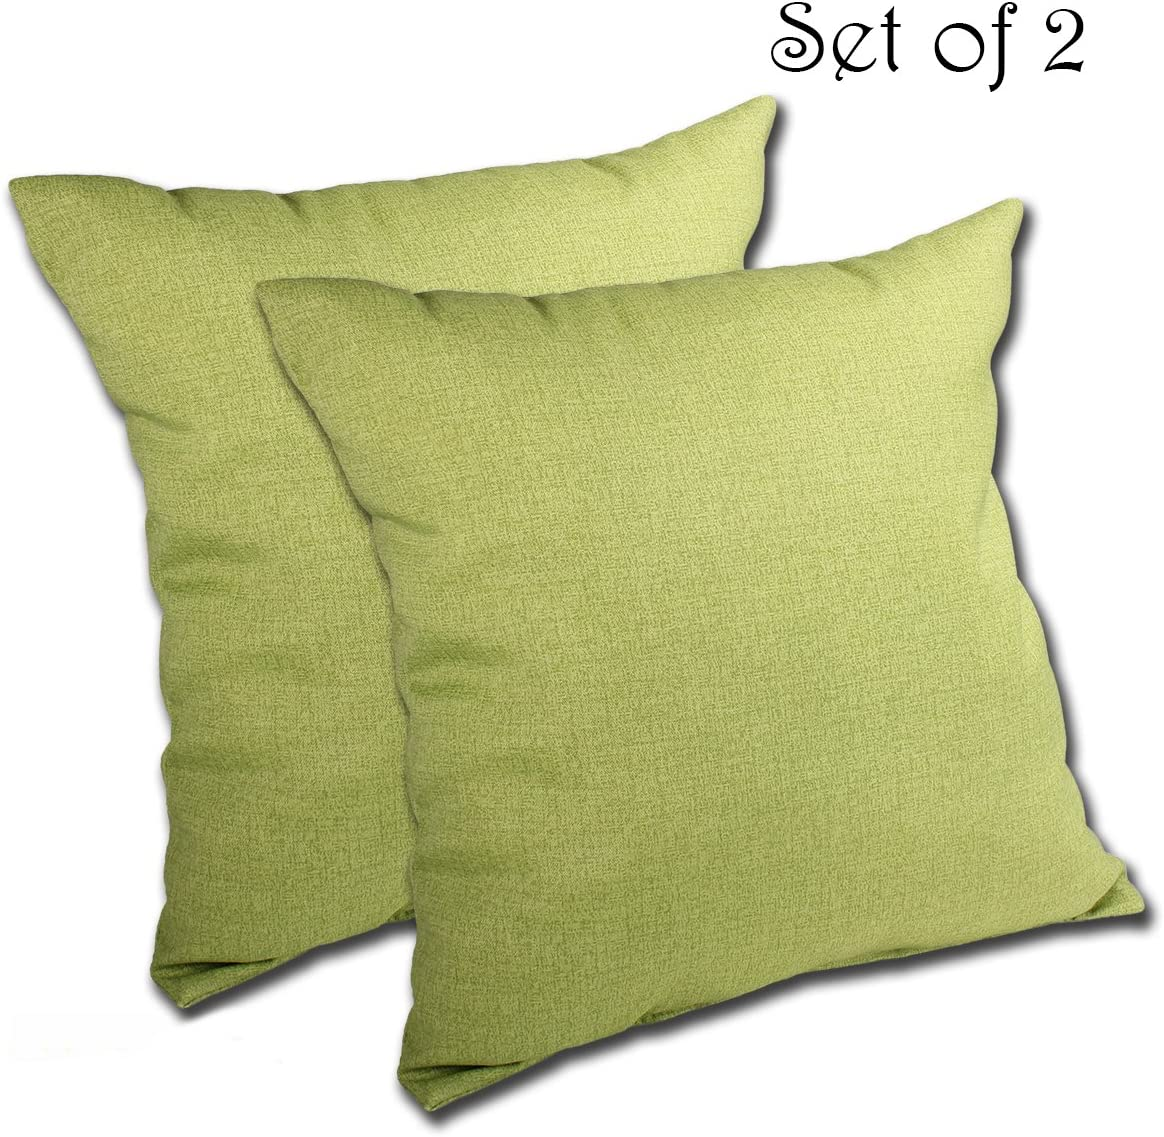 Comfort Classics Inc. Set of 2 16W x 16D x 5H Spun Polyester Outdoor Throw Pillow in Husk Texture Leaf